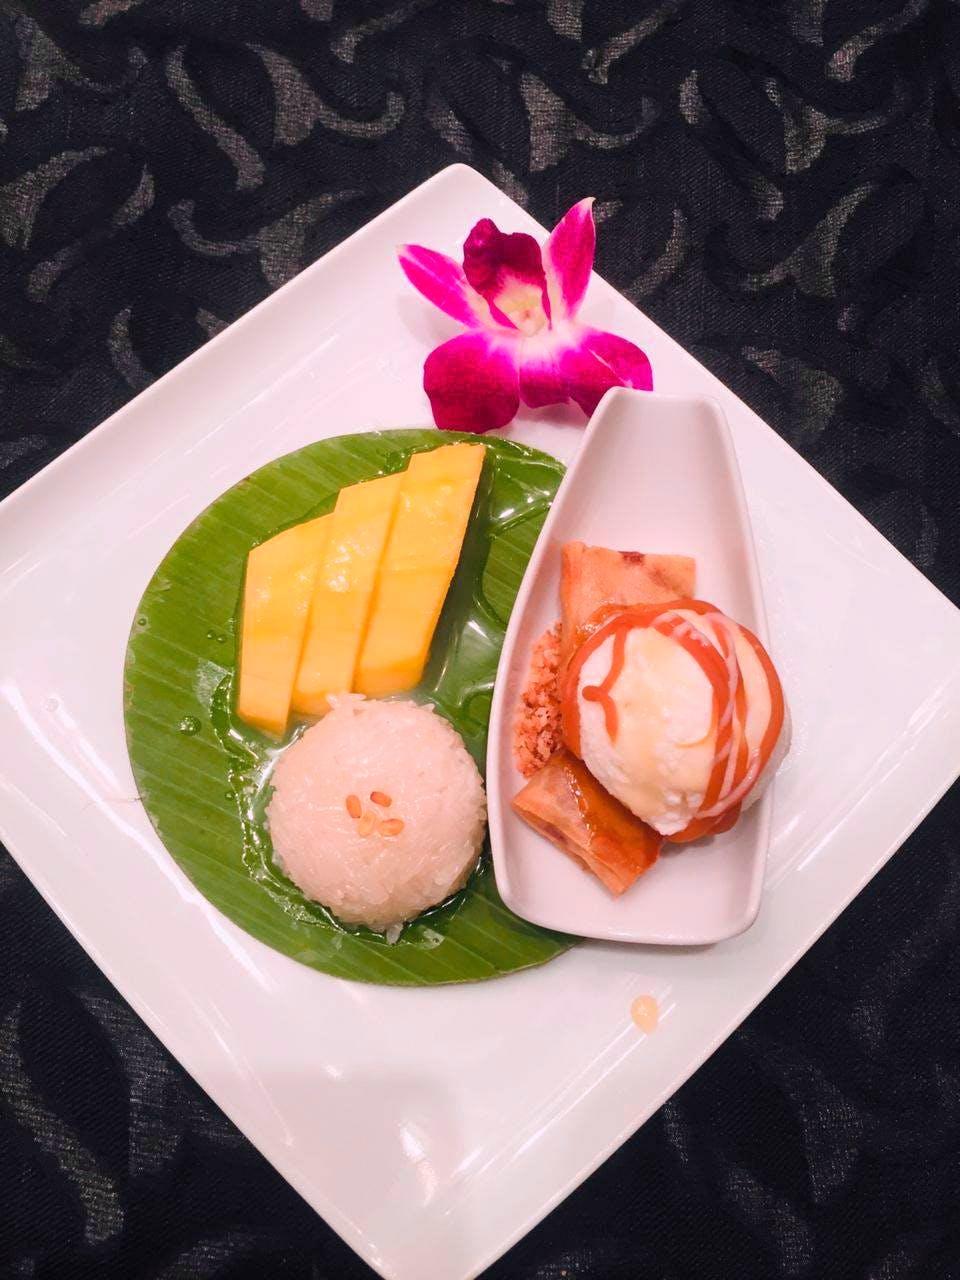 Dish,Food,Cuisine,Ingredient,Garnish,Comfort food,Steamed rice,Produce,Hiyayakko,À la carte food